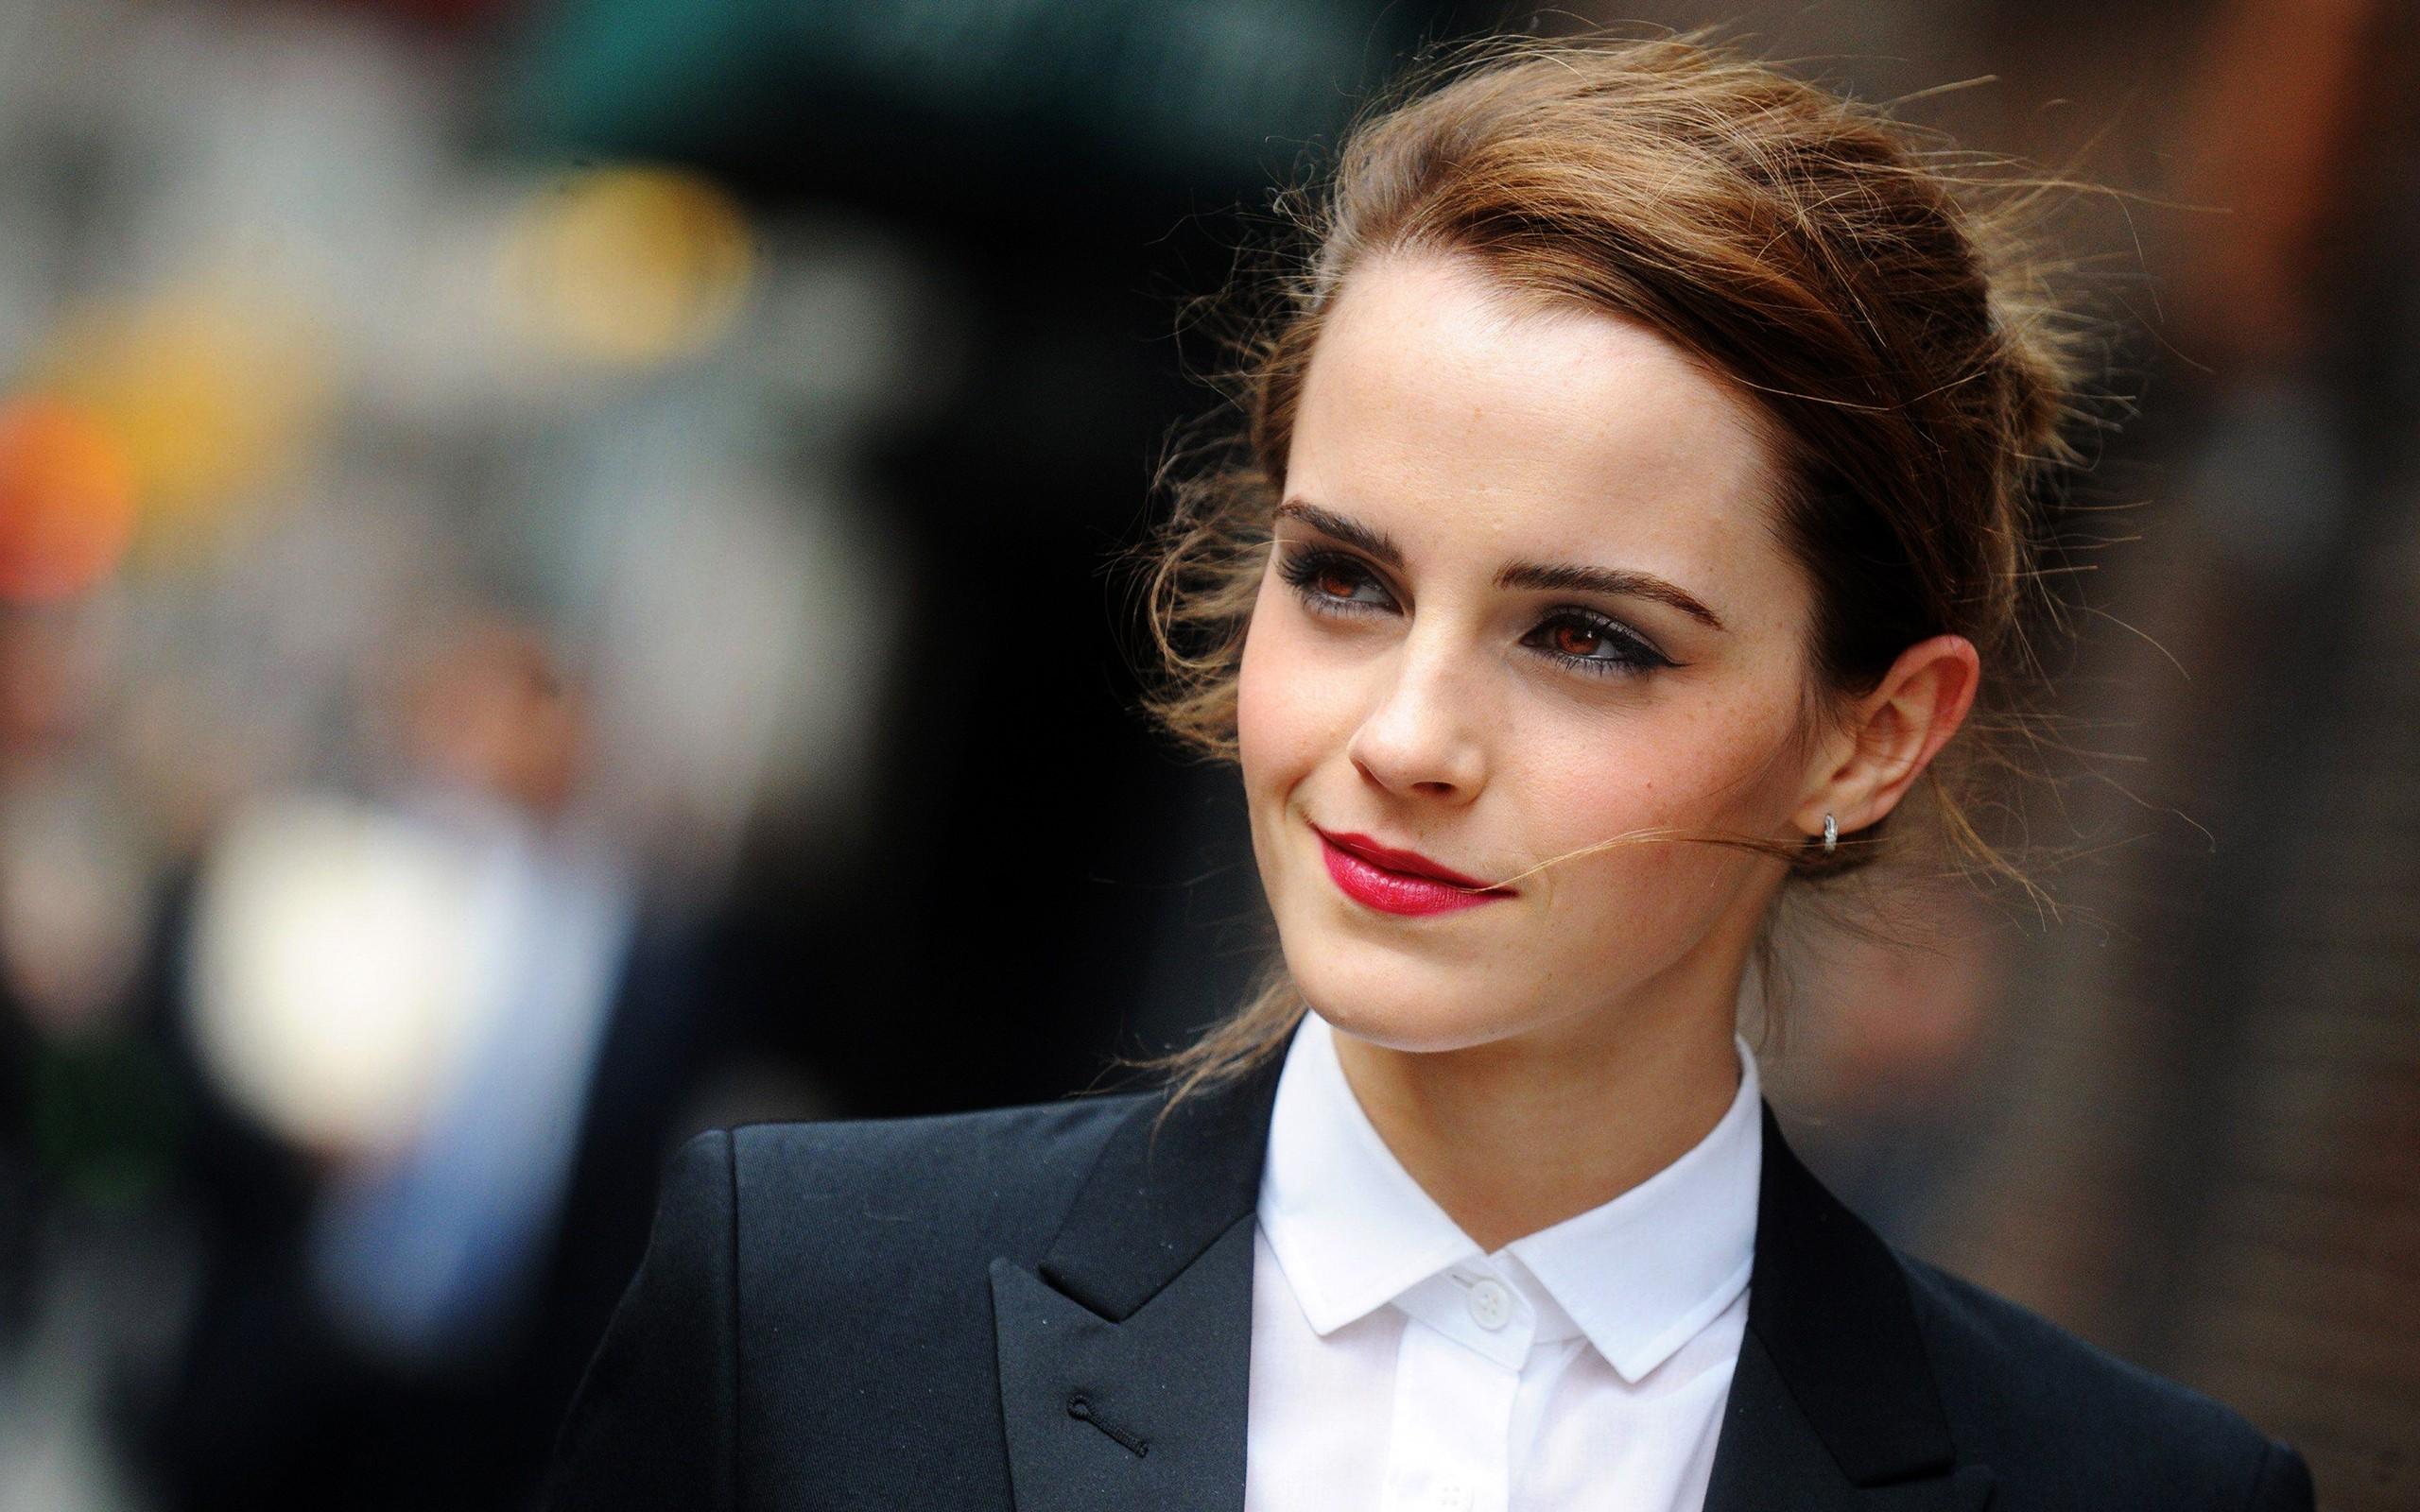 Emma Watson actress smile face make up